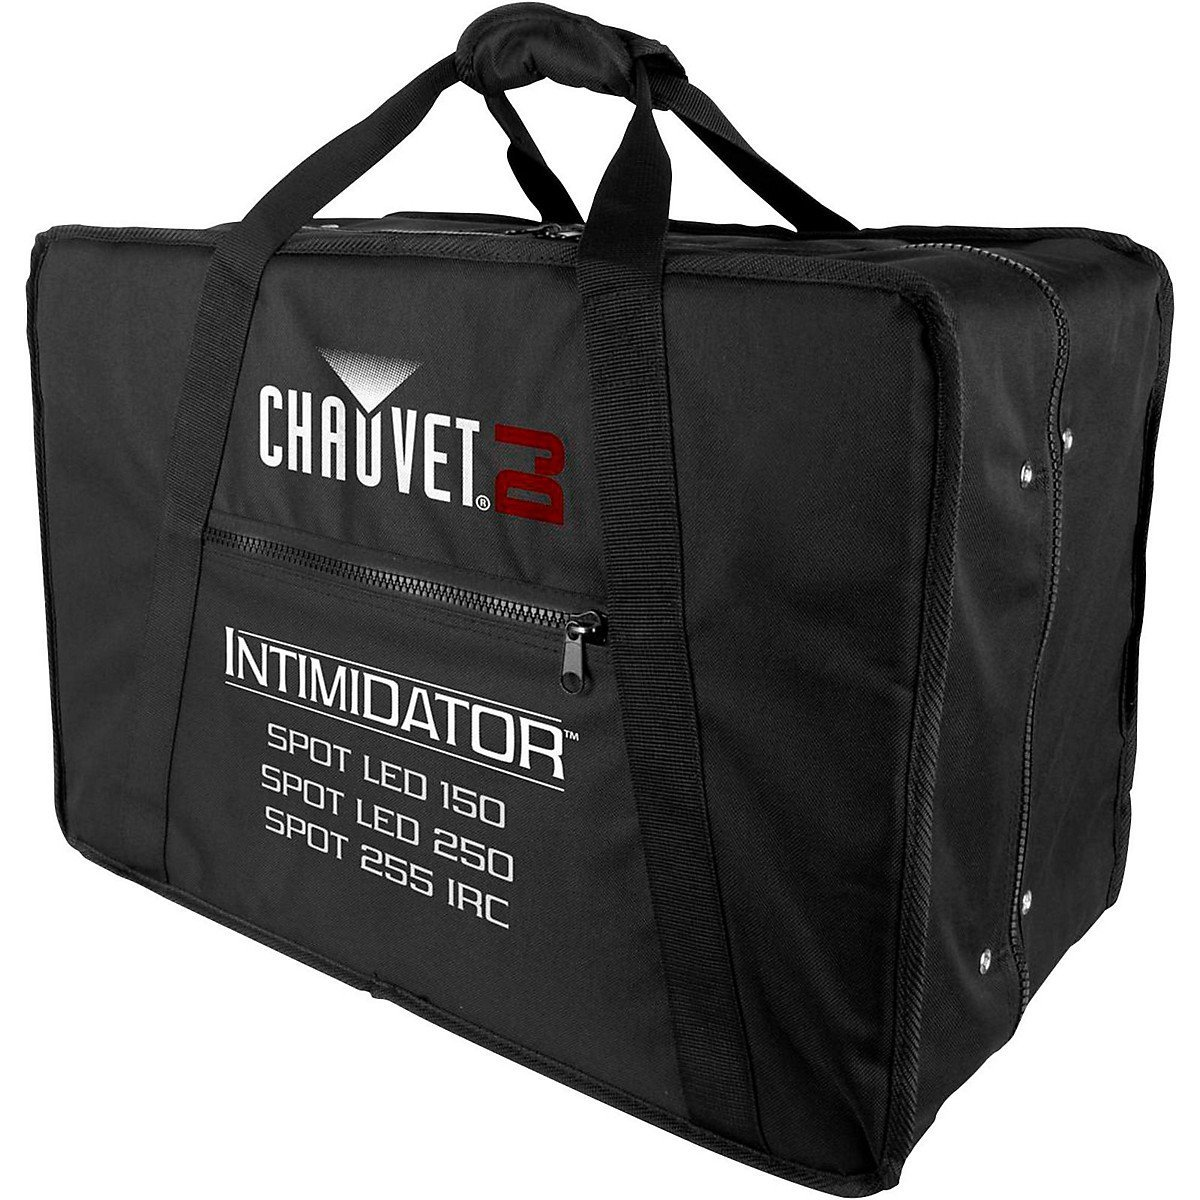 Chauvet CHS X5X Bag for Intimidator Series Lights